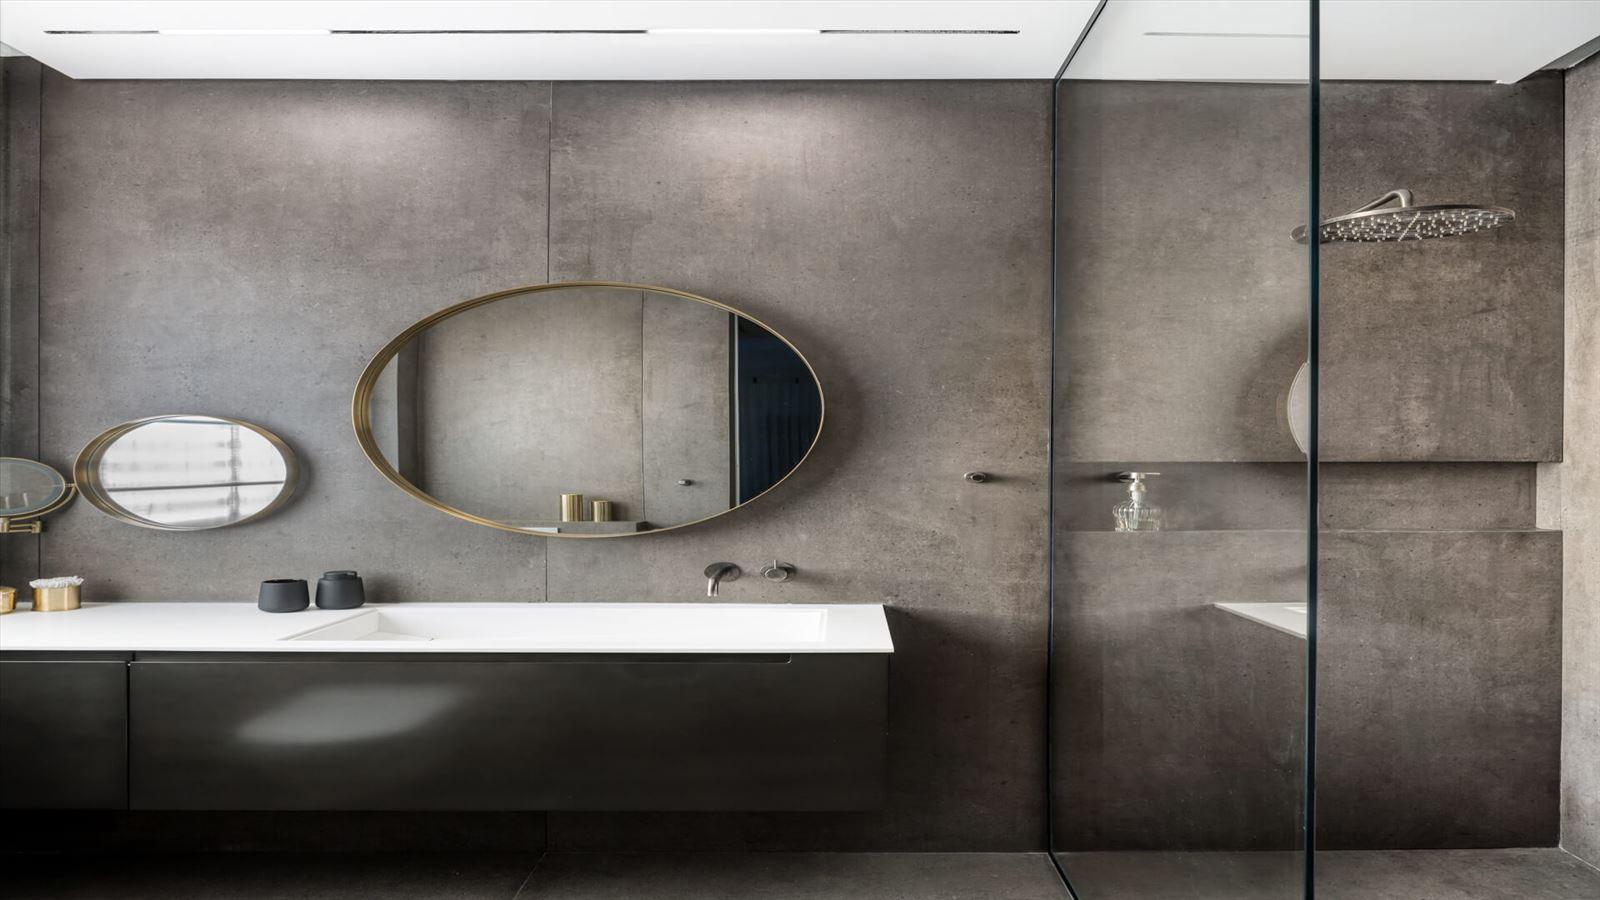 Penthouse Carmelit -  עיצוב תאורת אמבטיה על ידי דורי קמחי